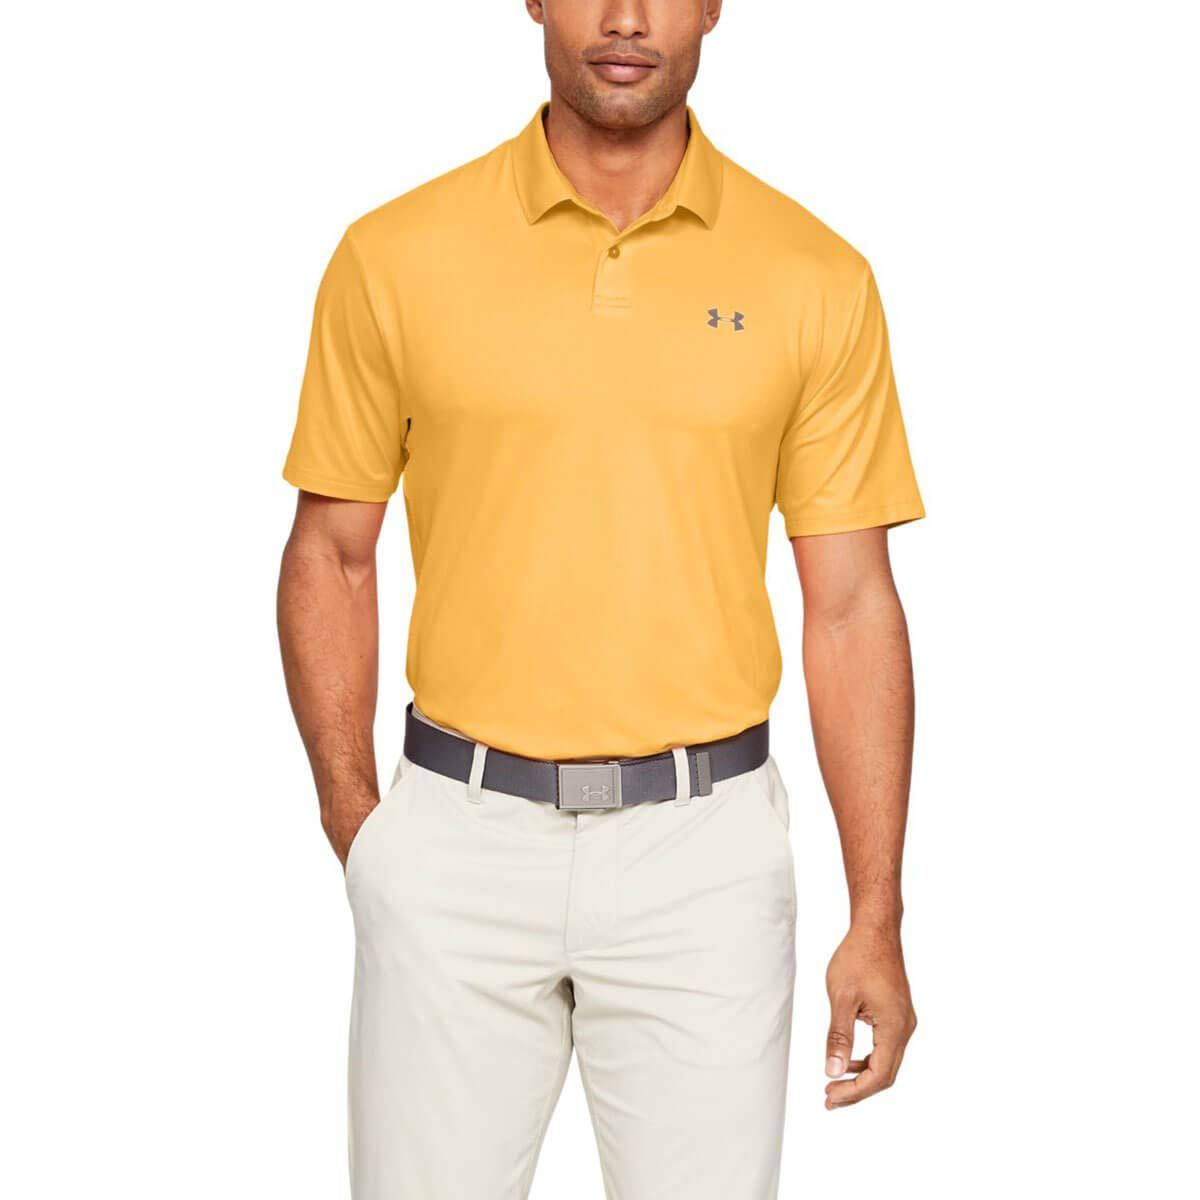 Under Armour Golf Performance Polo 2.0 Mango Orange/Pitch Gray 3XL ...